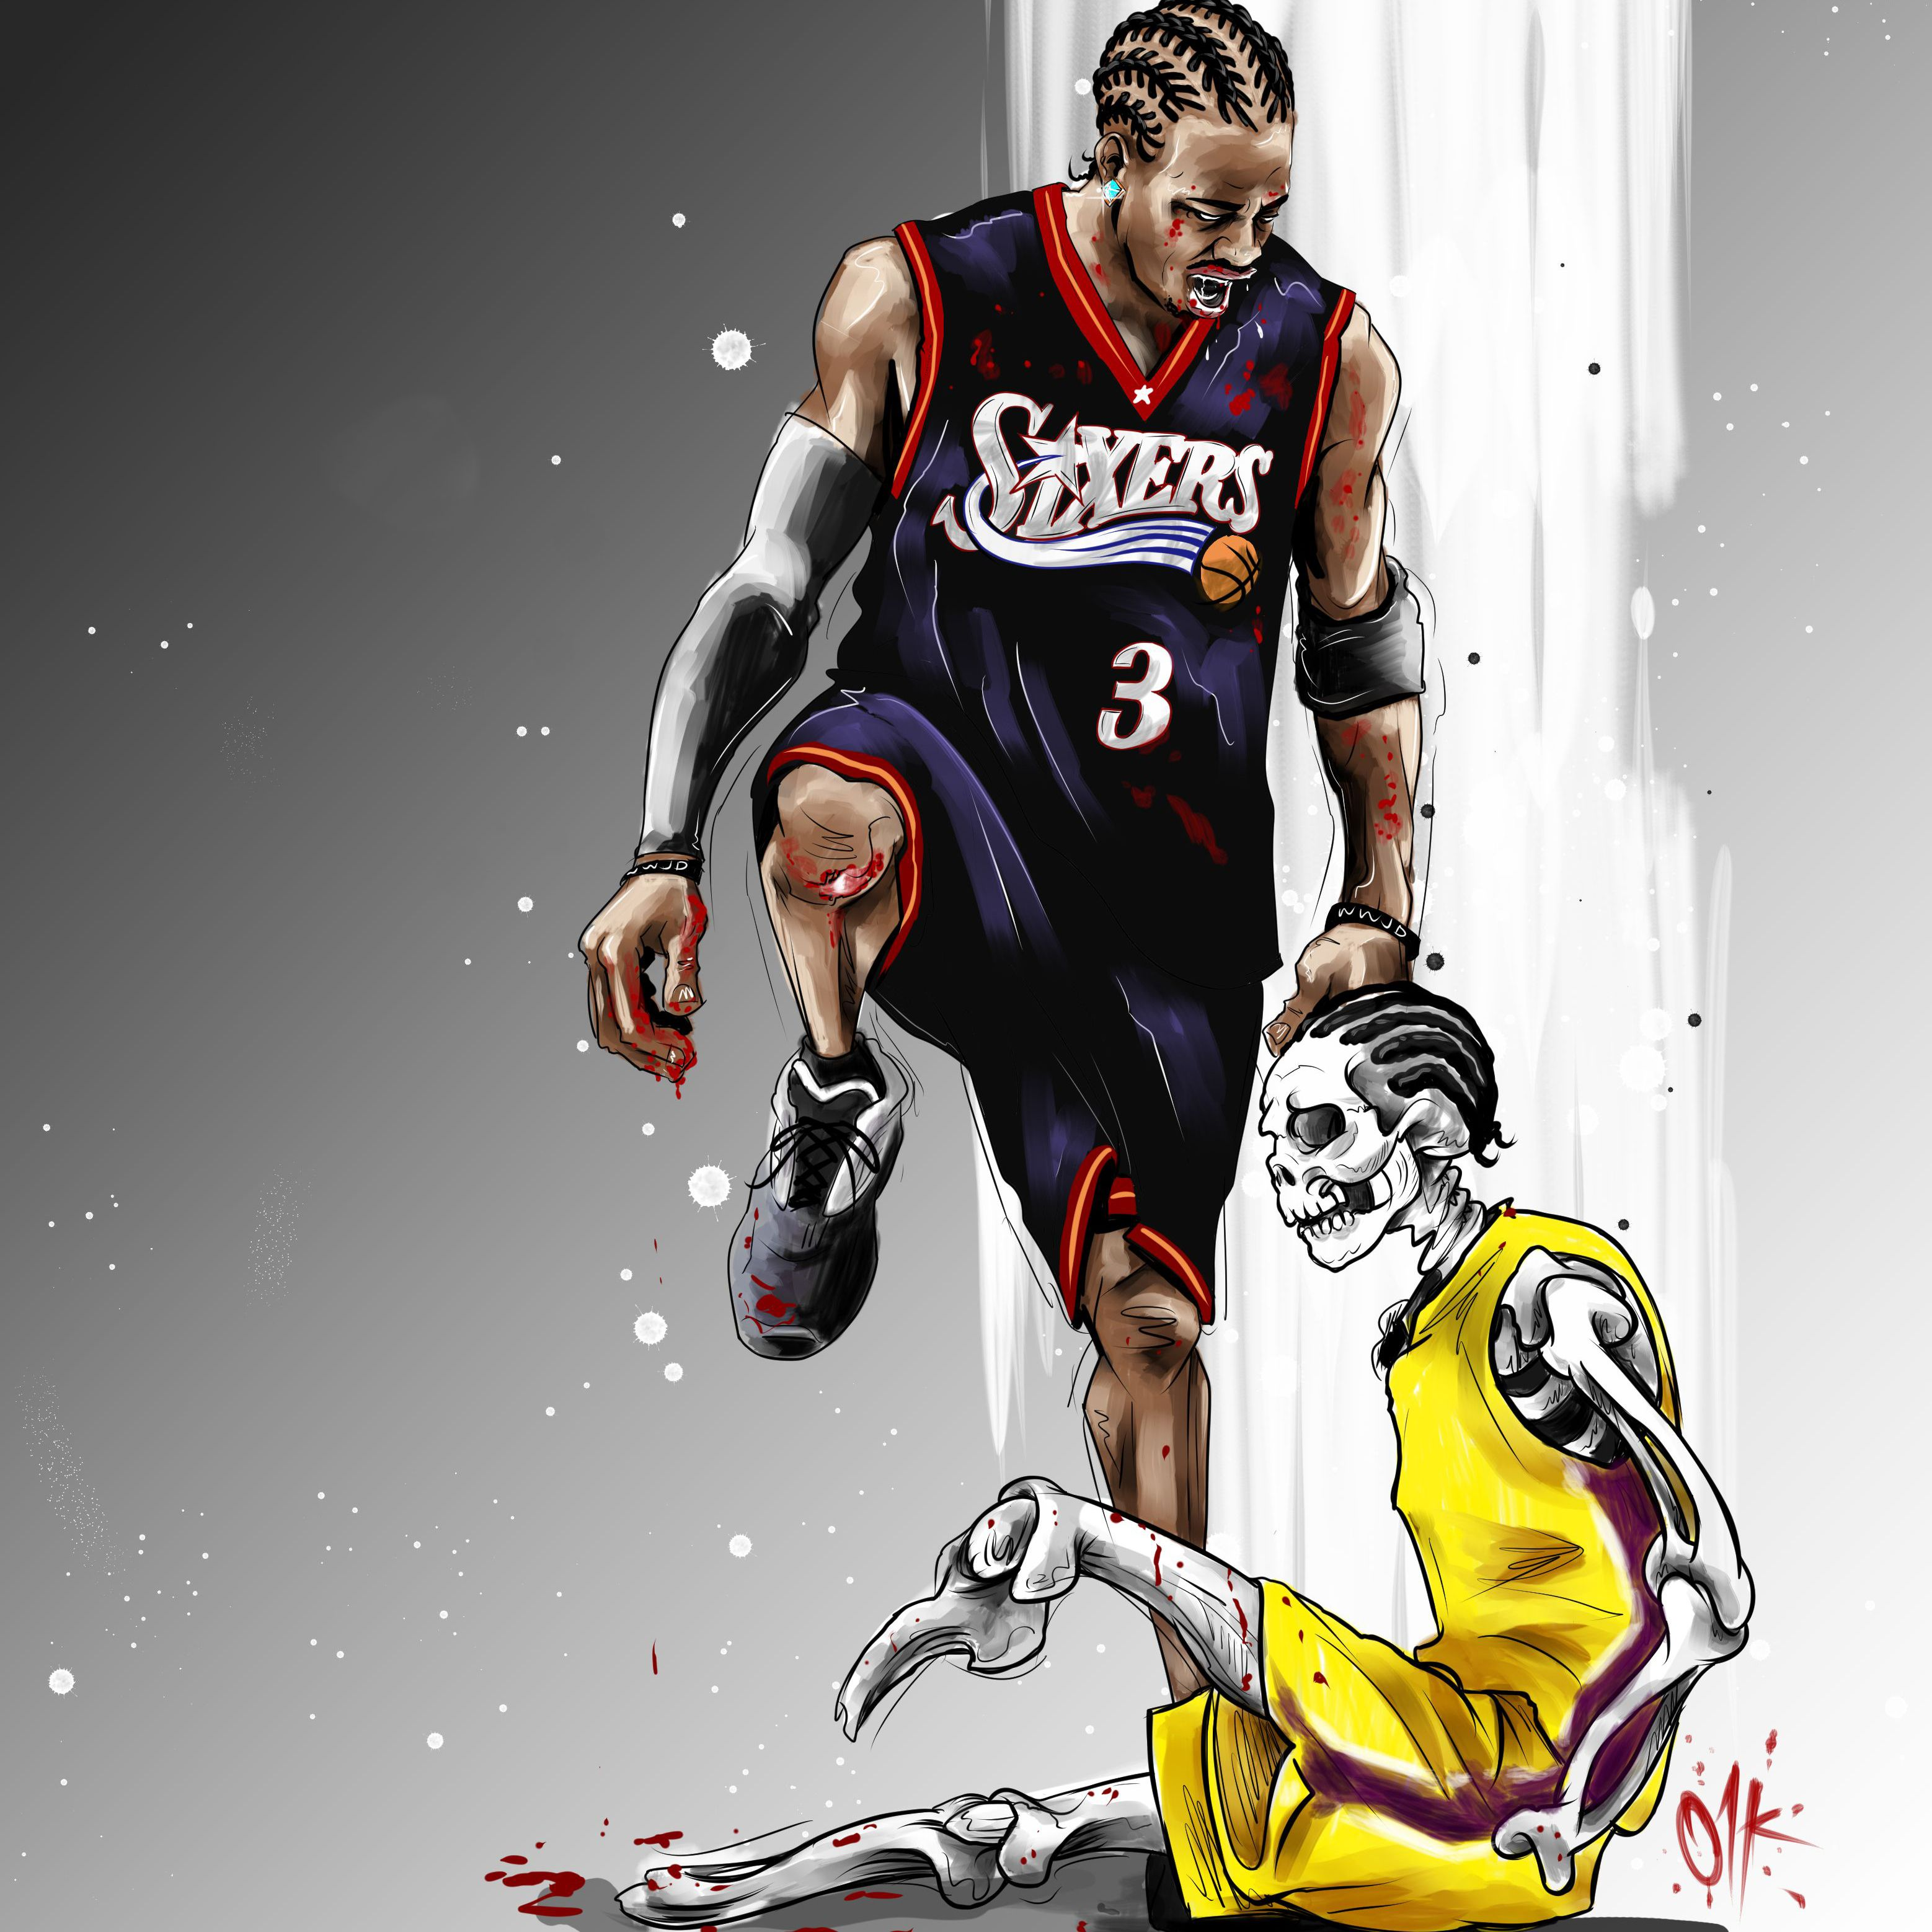 Allen Iverson Stepover In 2020 Allen Iverson Nba Basketball Art Nba Pictures